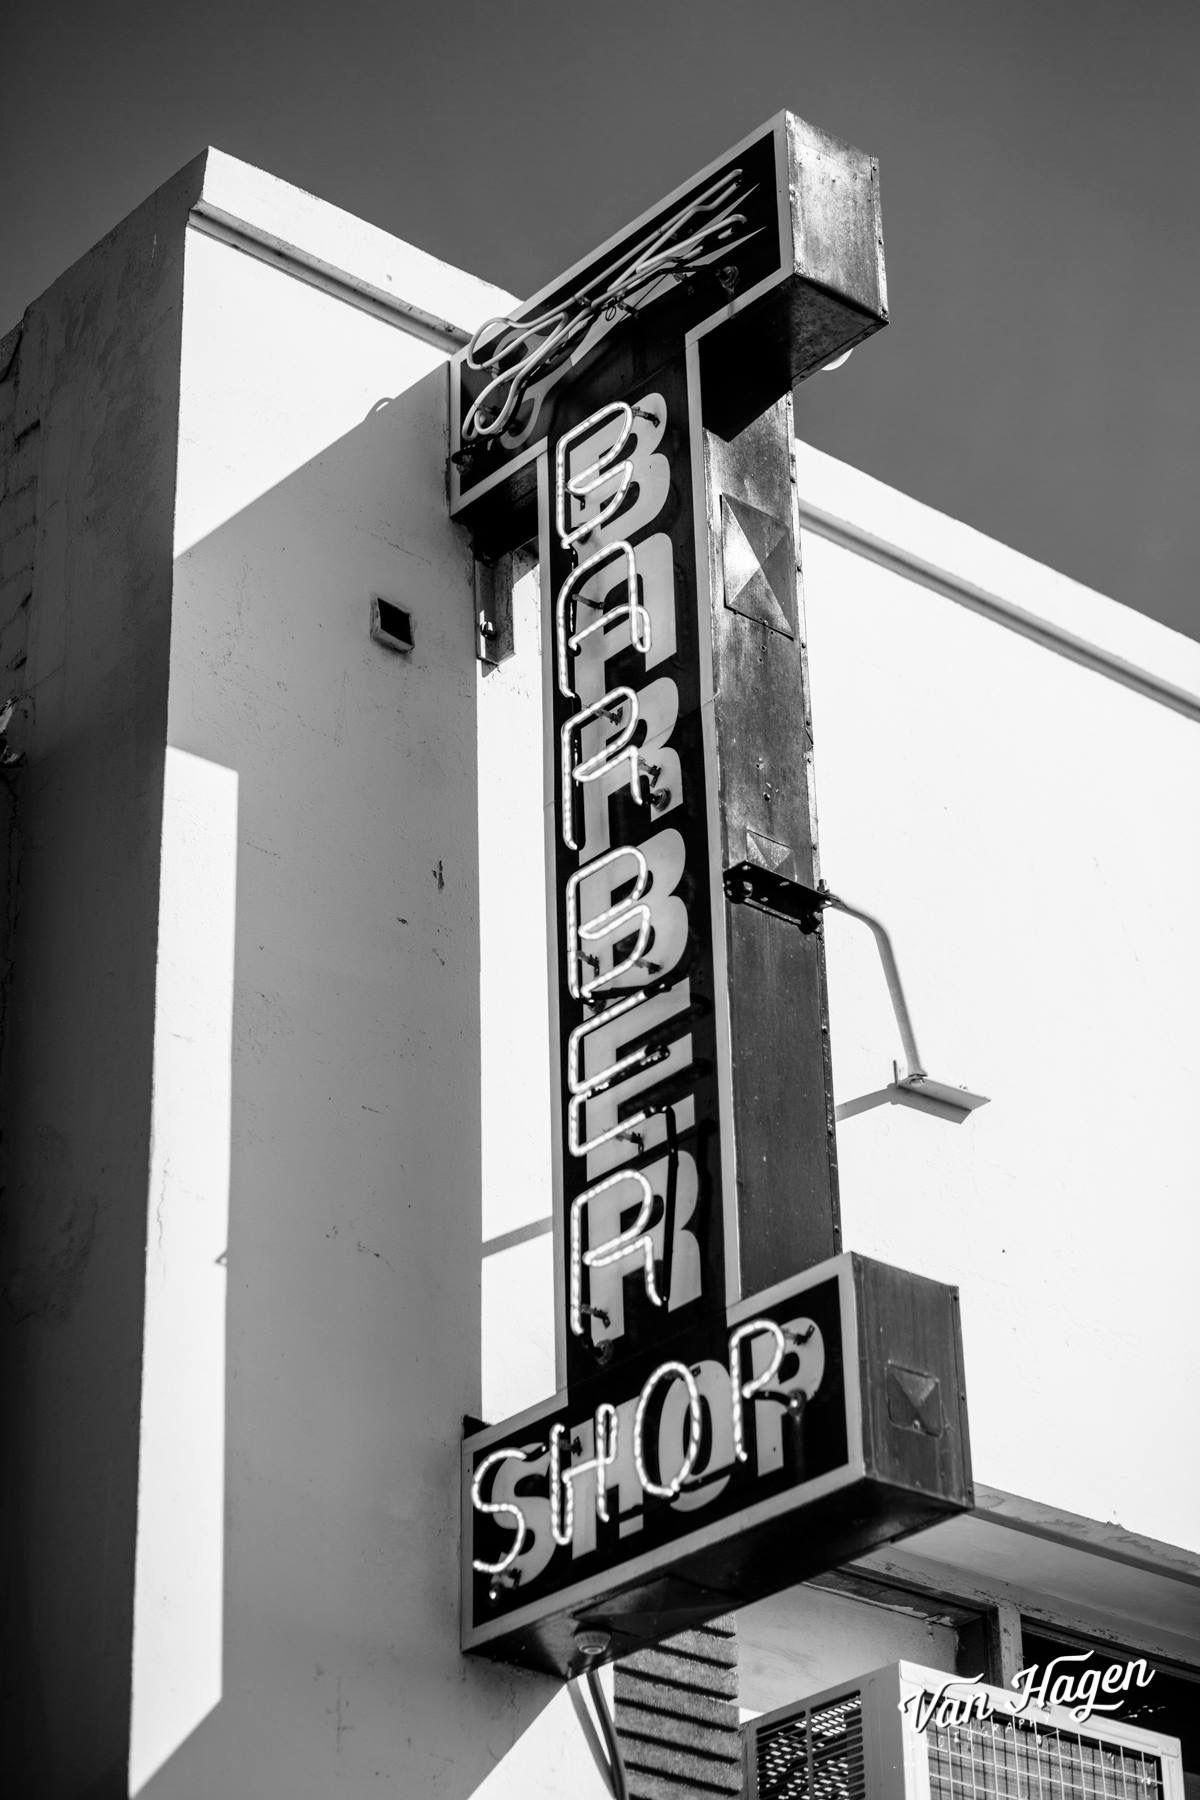 Pin by Sween on Jochen Hirschfeld's Photographs Broadway